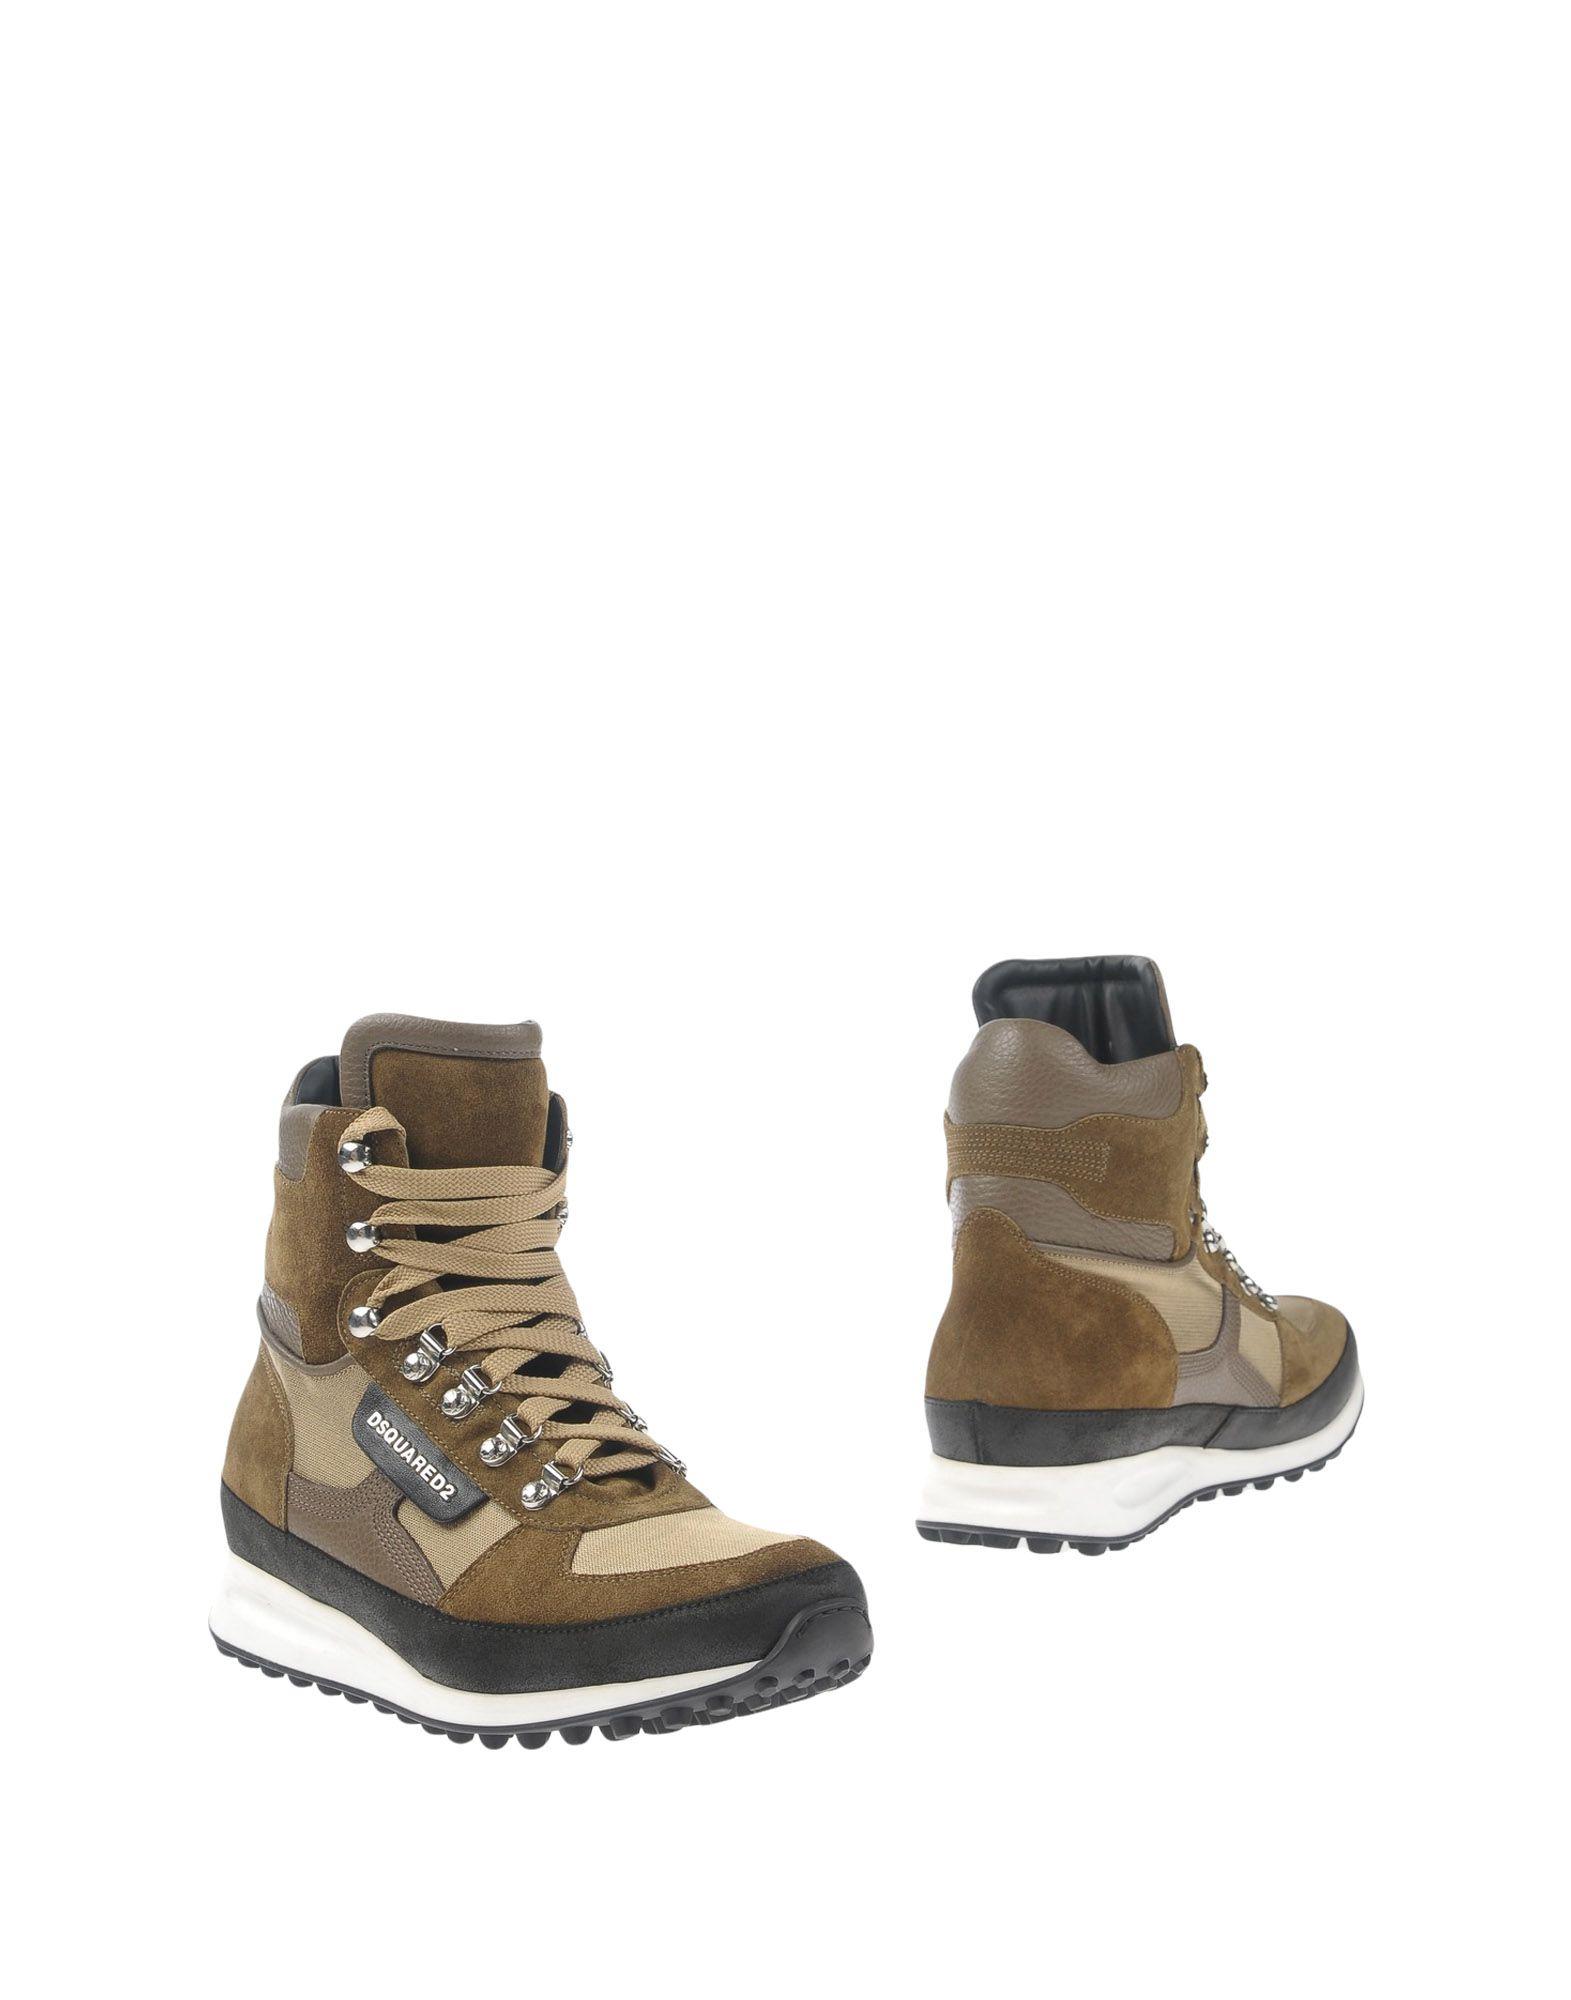 Dsquared2 Gute Stiefelette Herren  11298811IJ Gute Dsquared2 Qualität beliebte Schuhe af9580